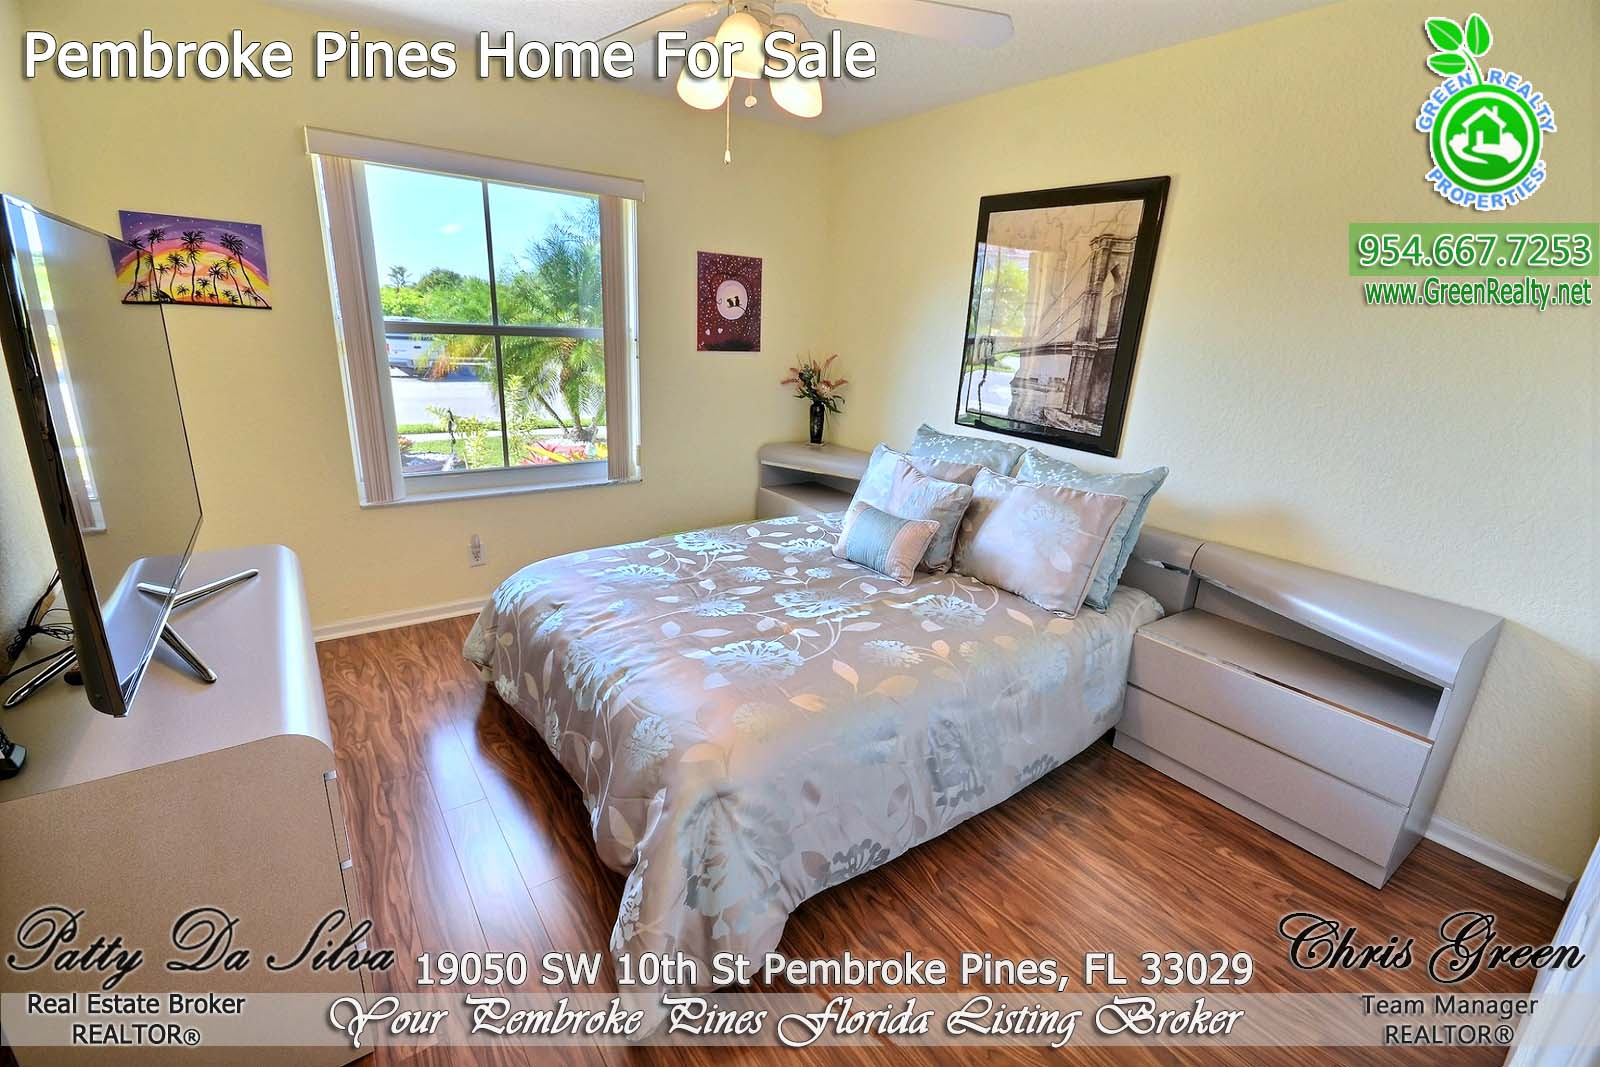 22 Real Estate in Pembroke Pines Florida (5)